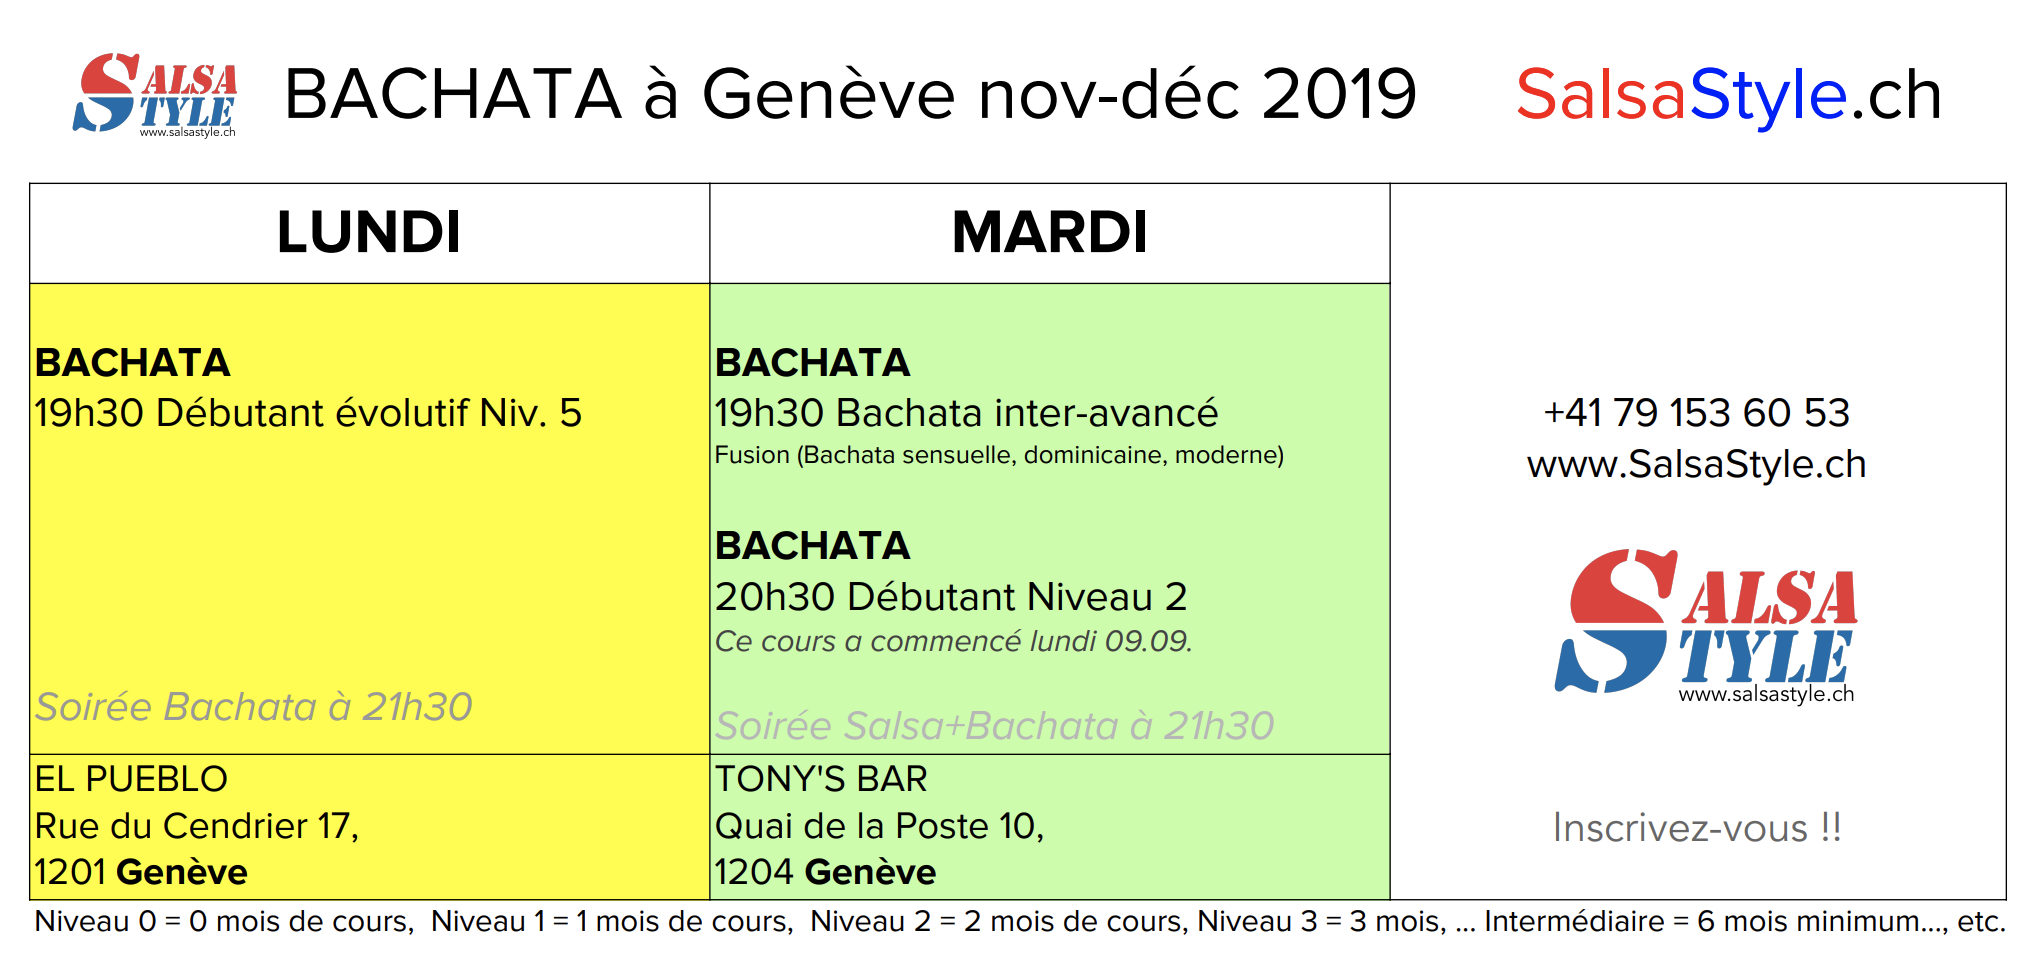 BACHATA GENEVE nov 2019 salsastyle.ch